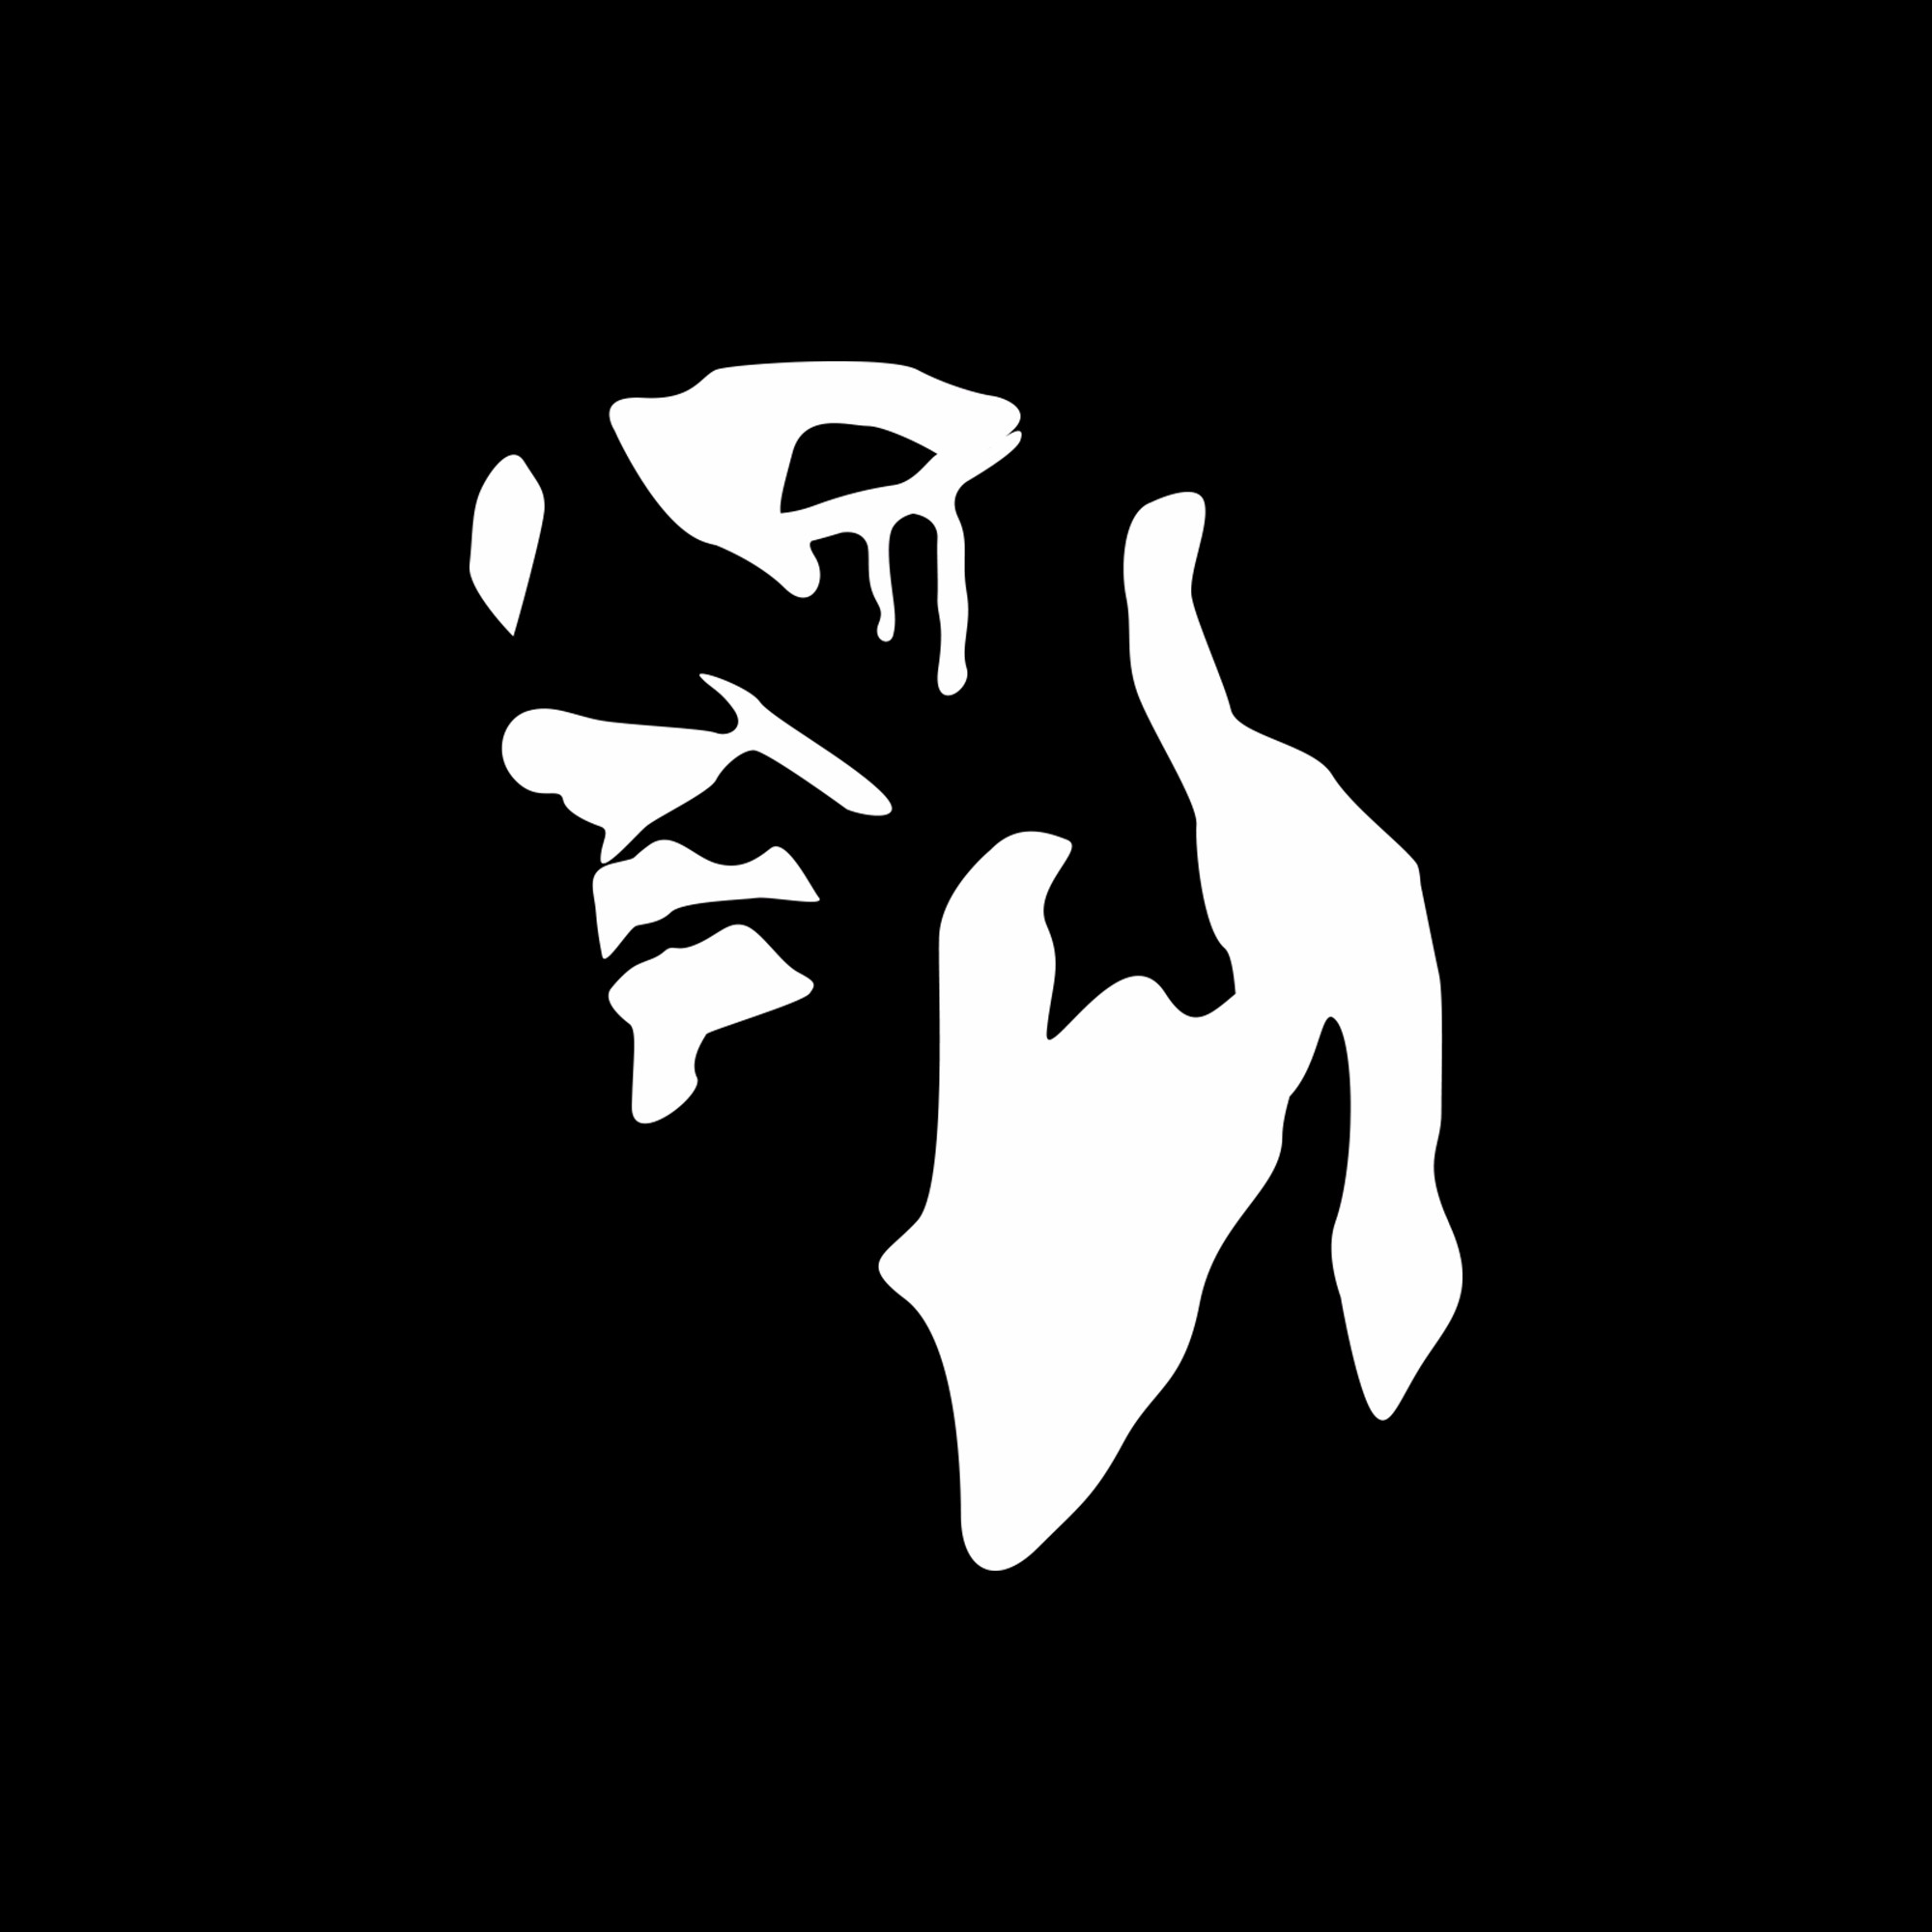 6emiltsreucqia4zqllw_logo